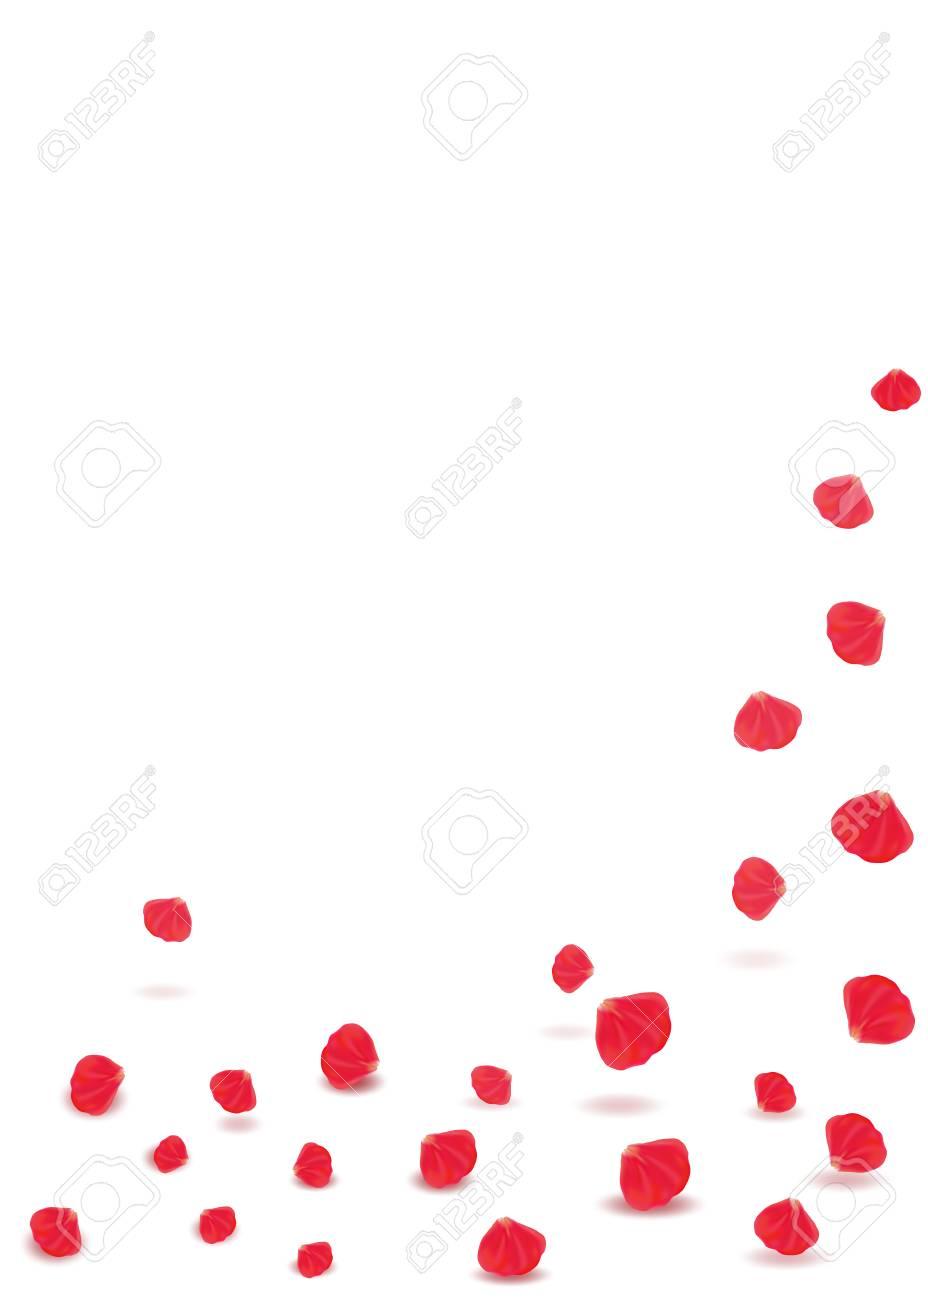 falling rose petals valentines